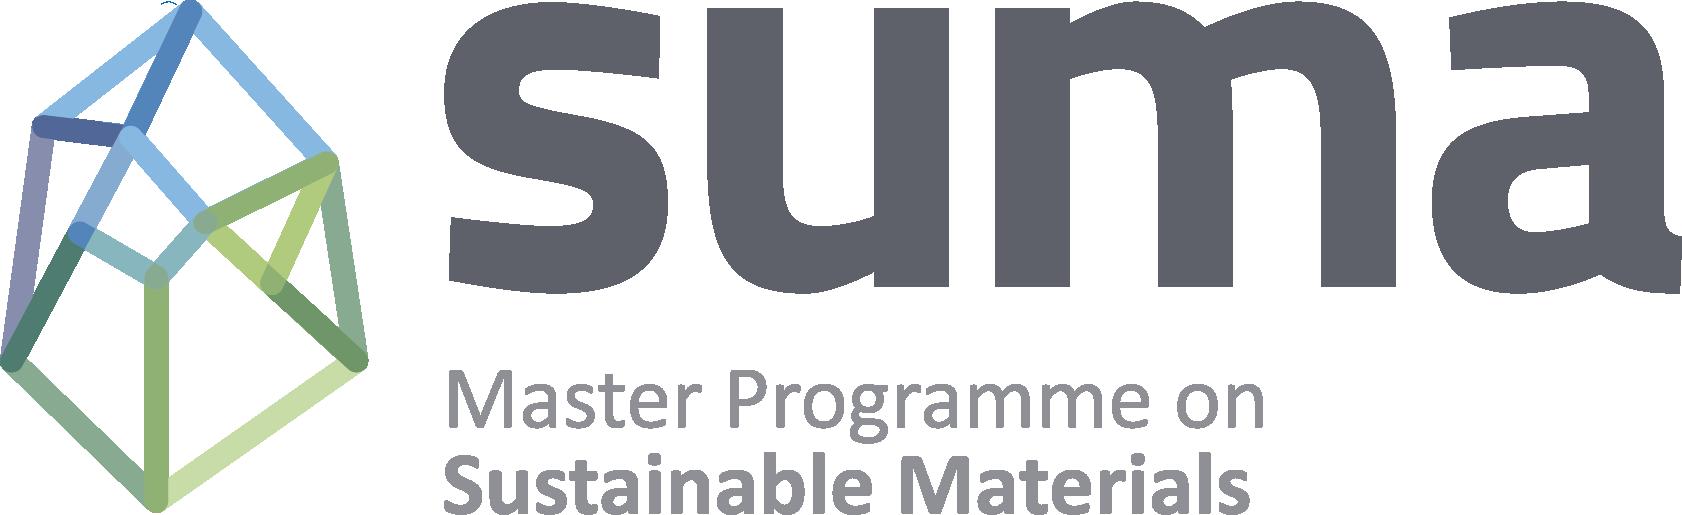 SUMA Master Programme on Sustainable Materials